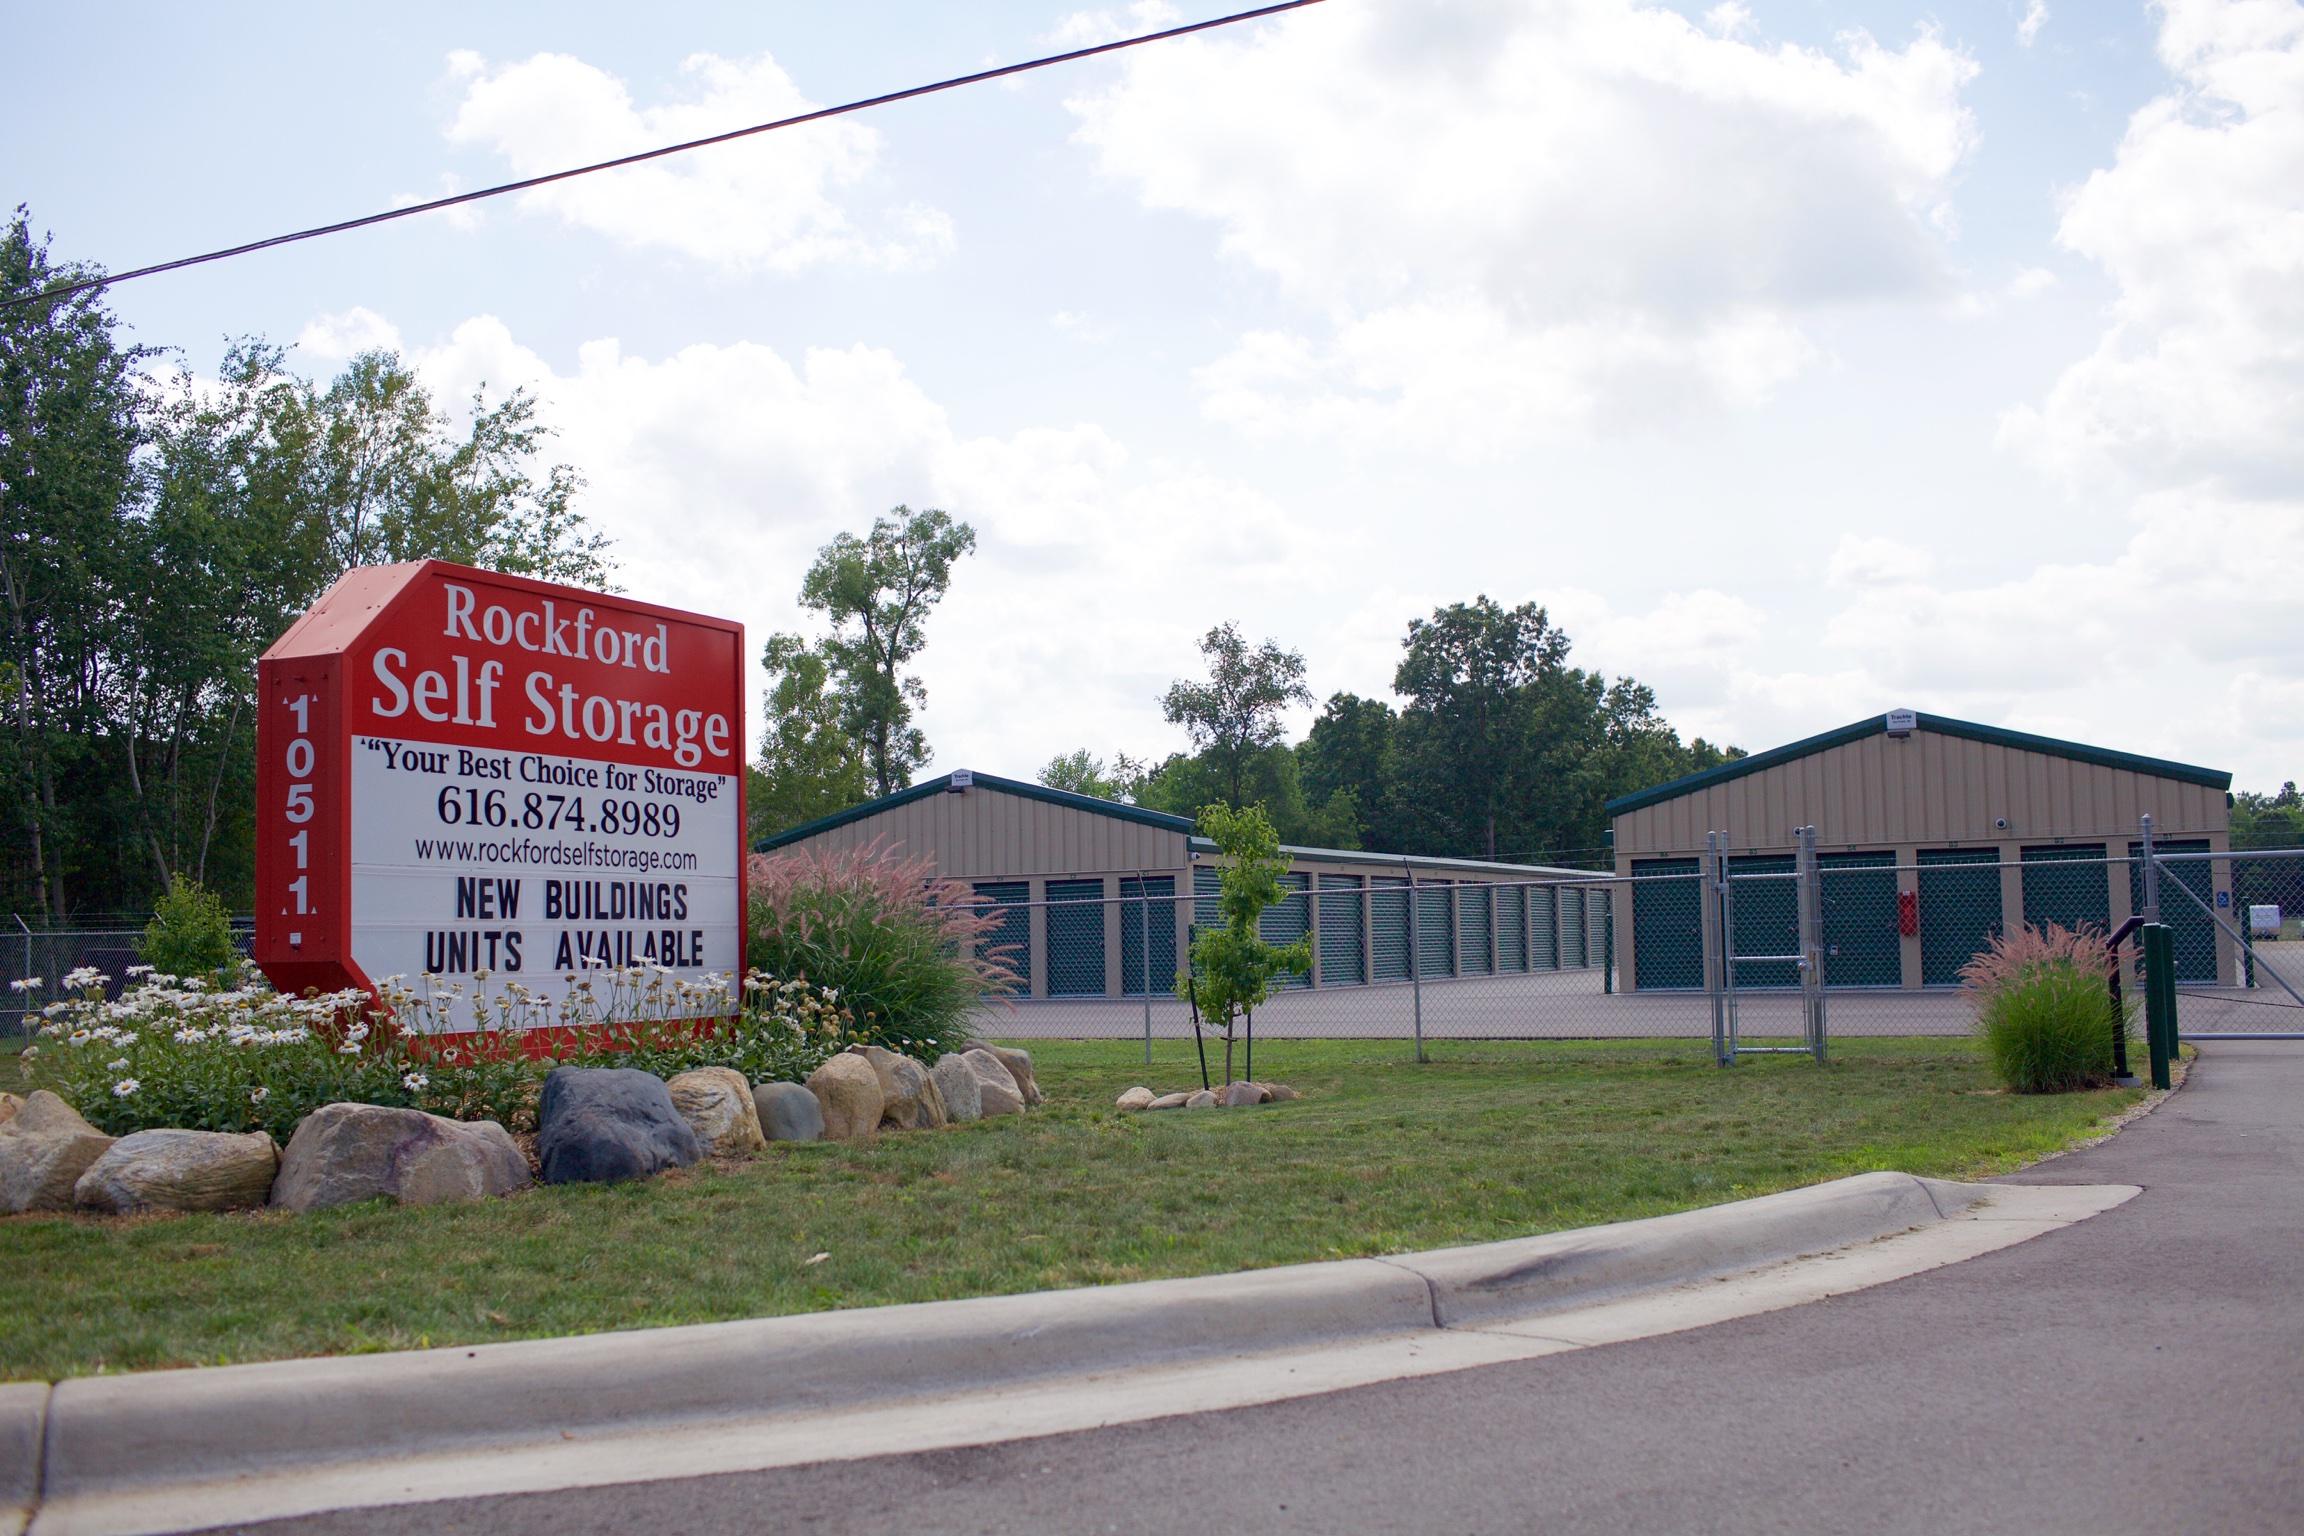 Rockford Self Storage North Location - 10511 Northland Dr NE. Rockford MI, 49341